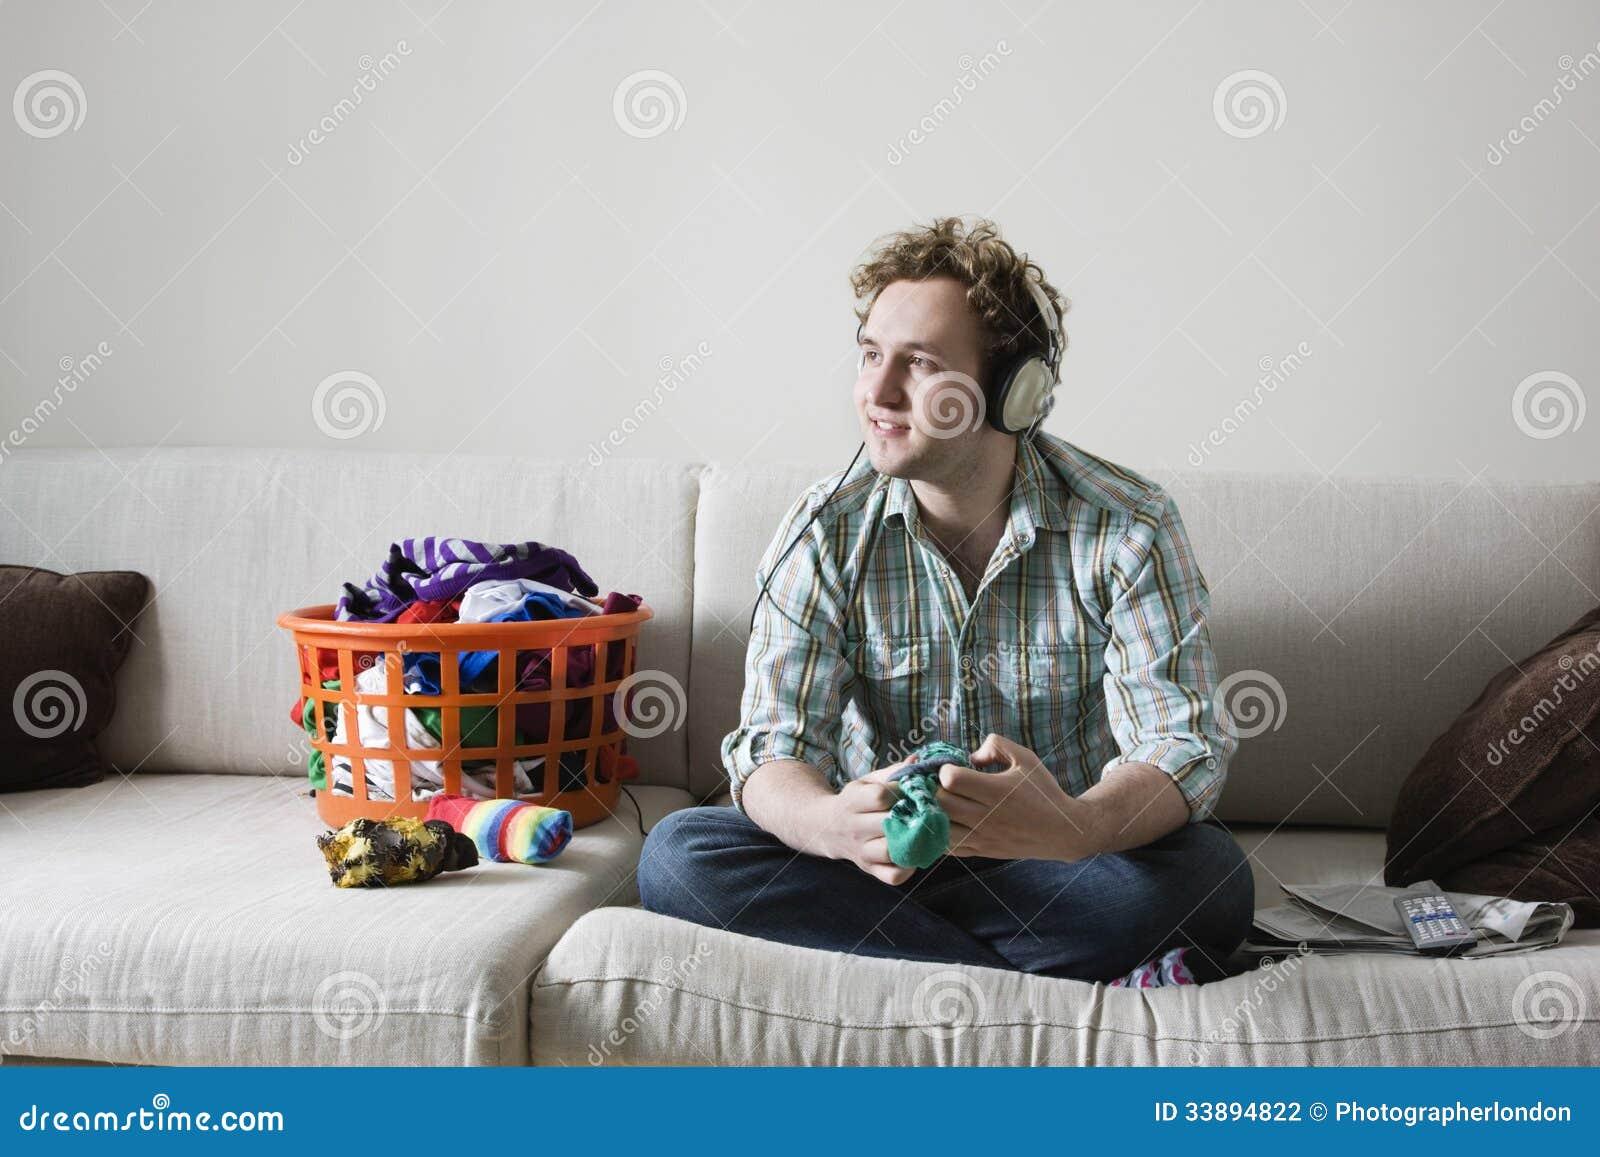 Man Listening Music While Folding Laundry On Sofa Stock